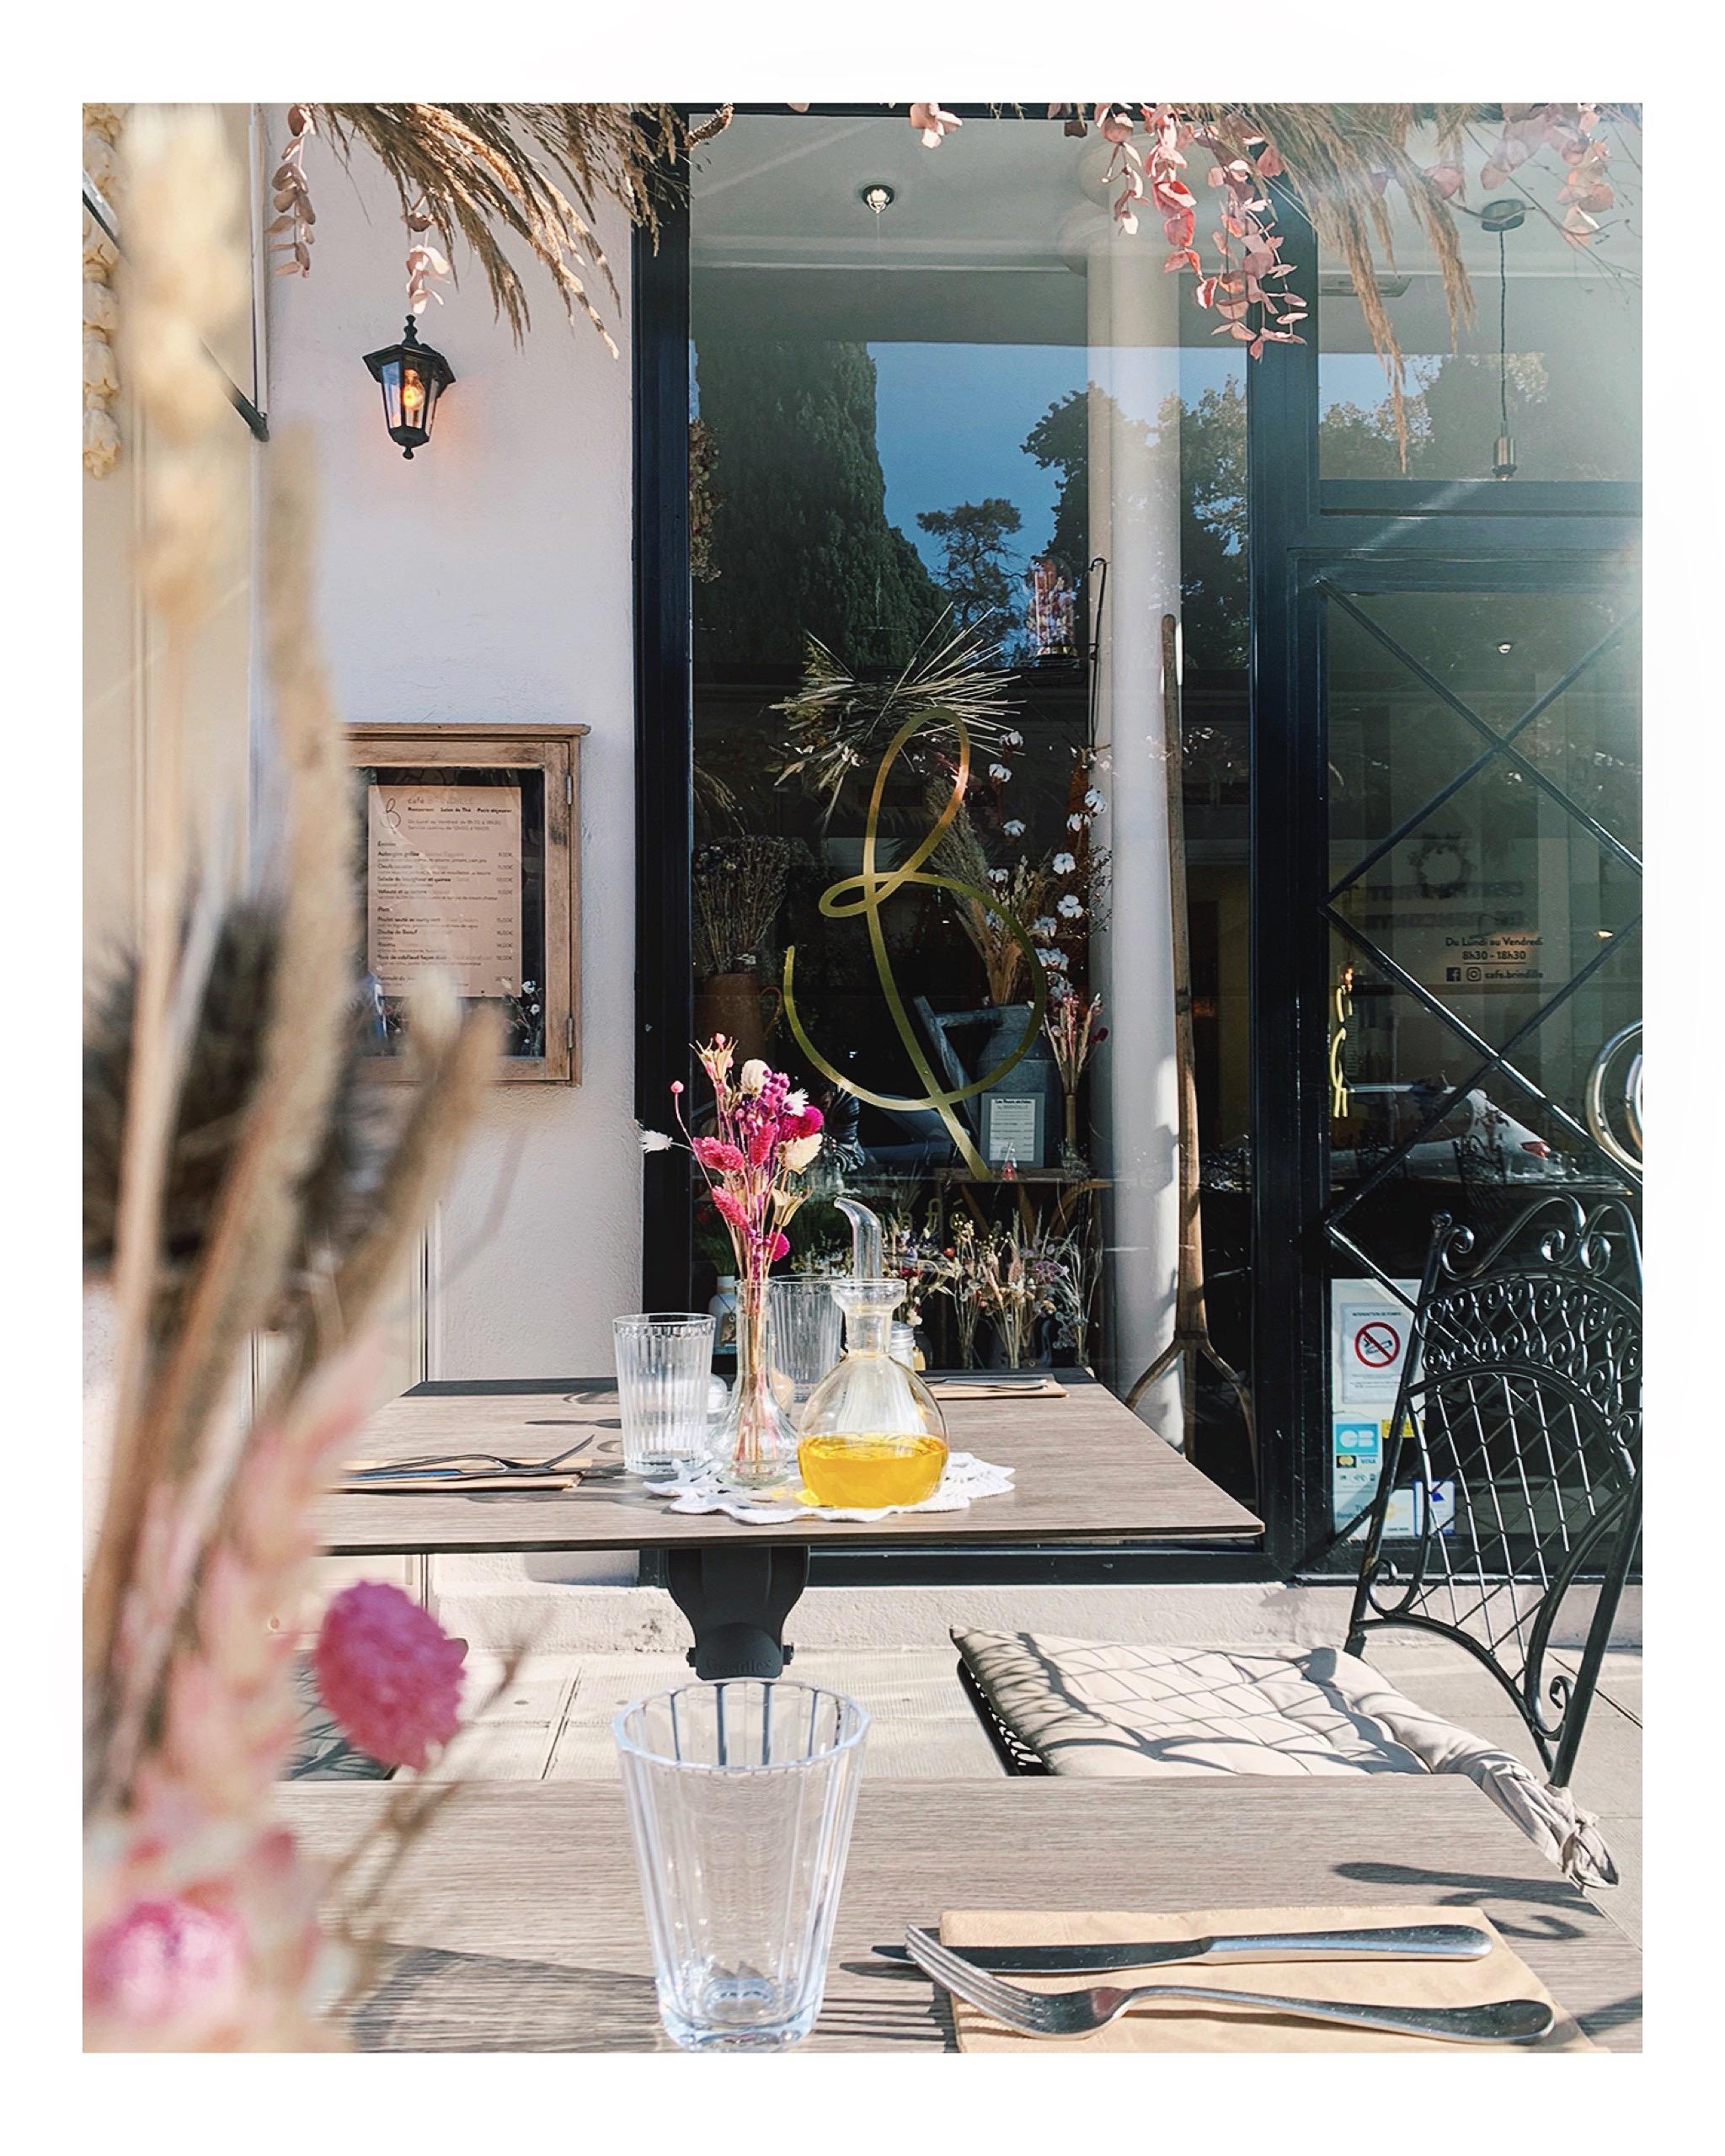 Café_BRINDILLE_restaurant